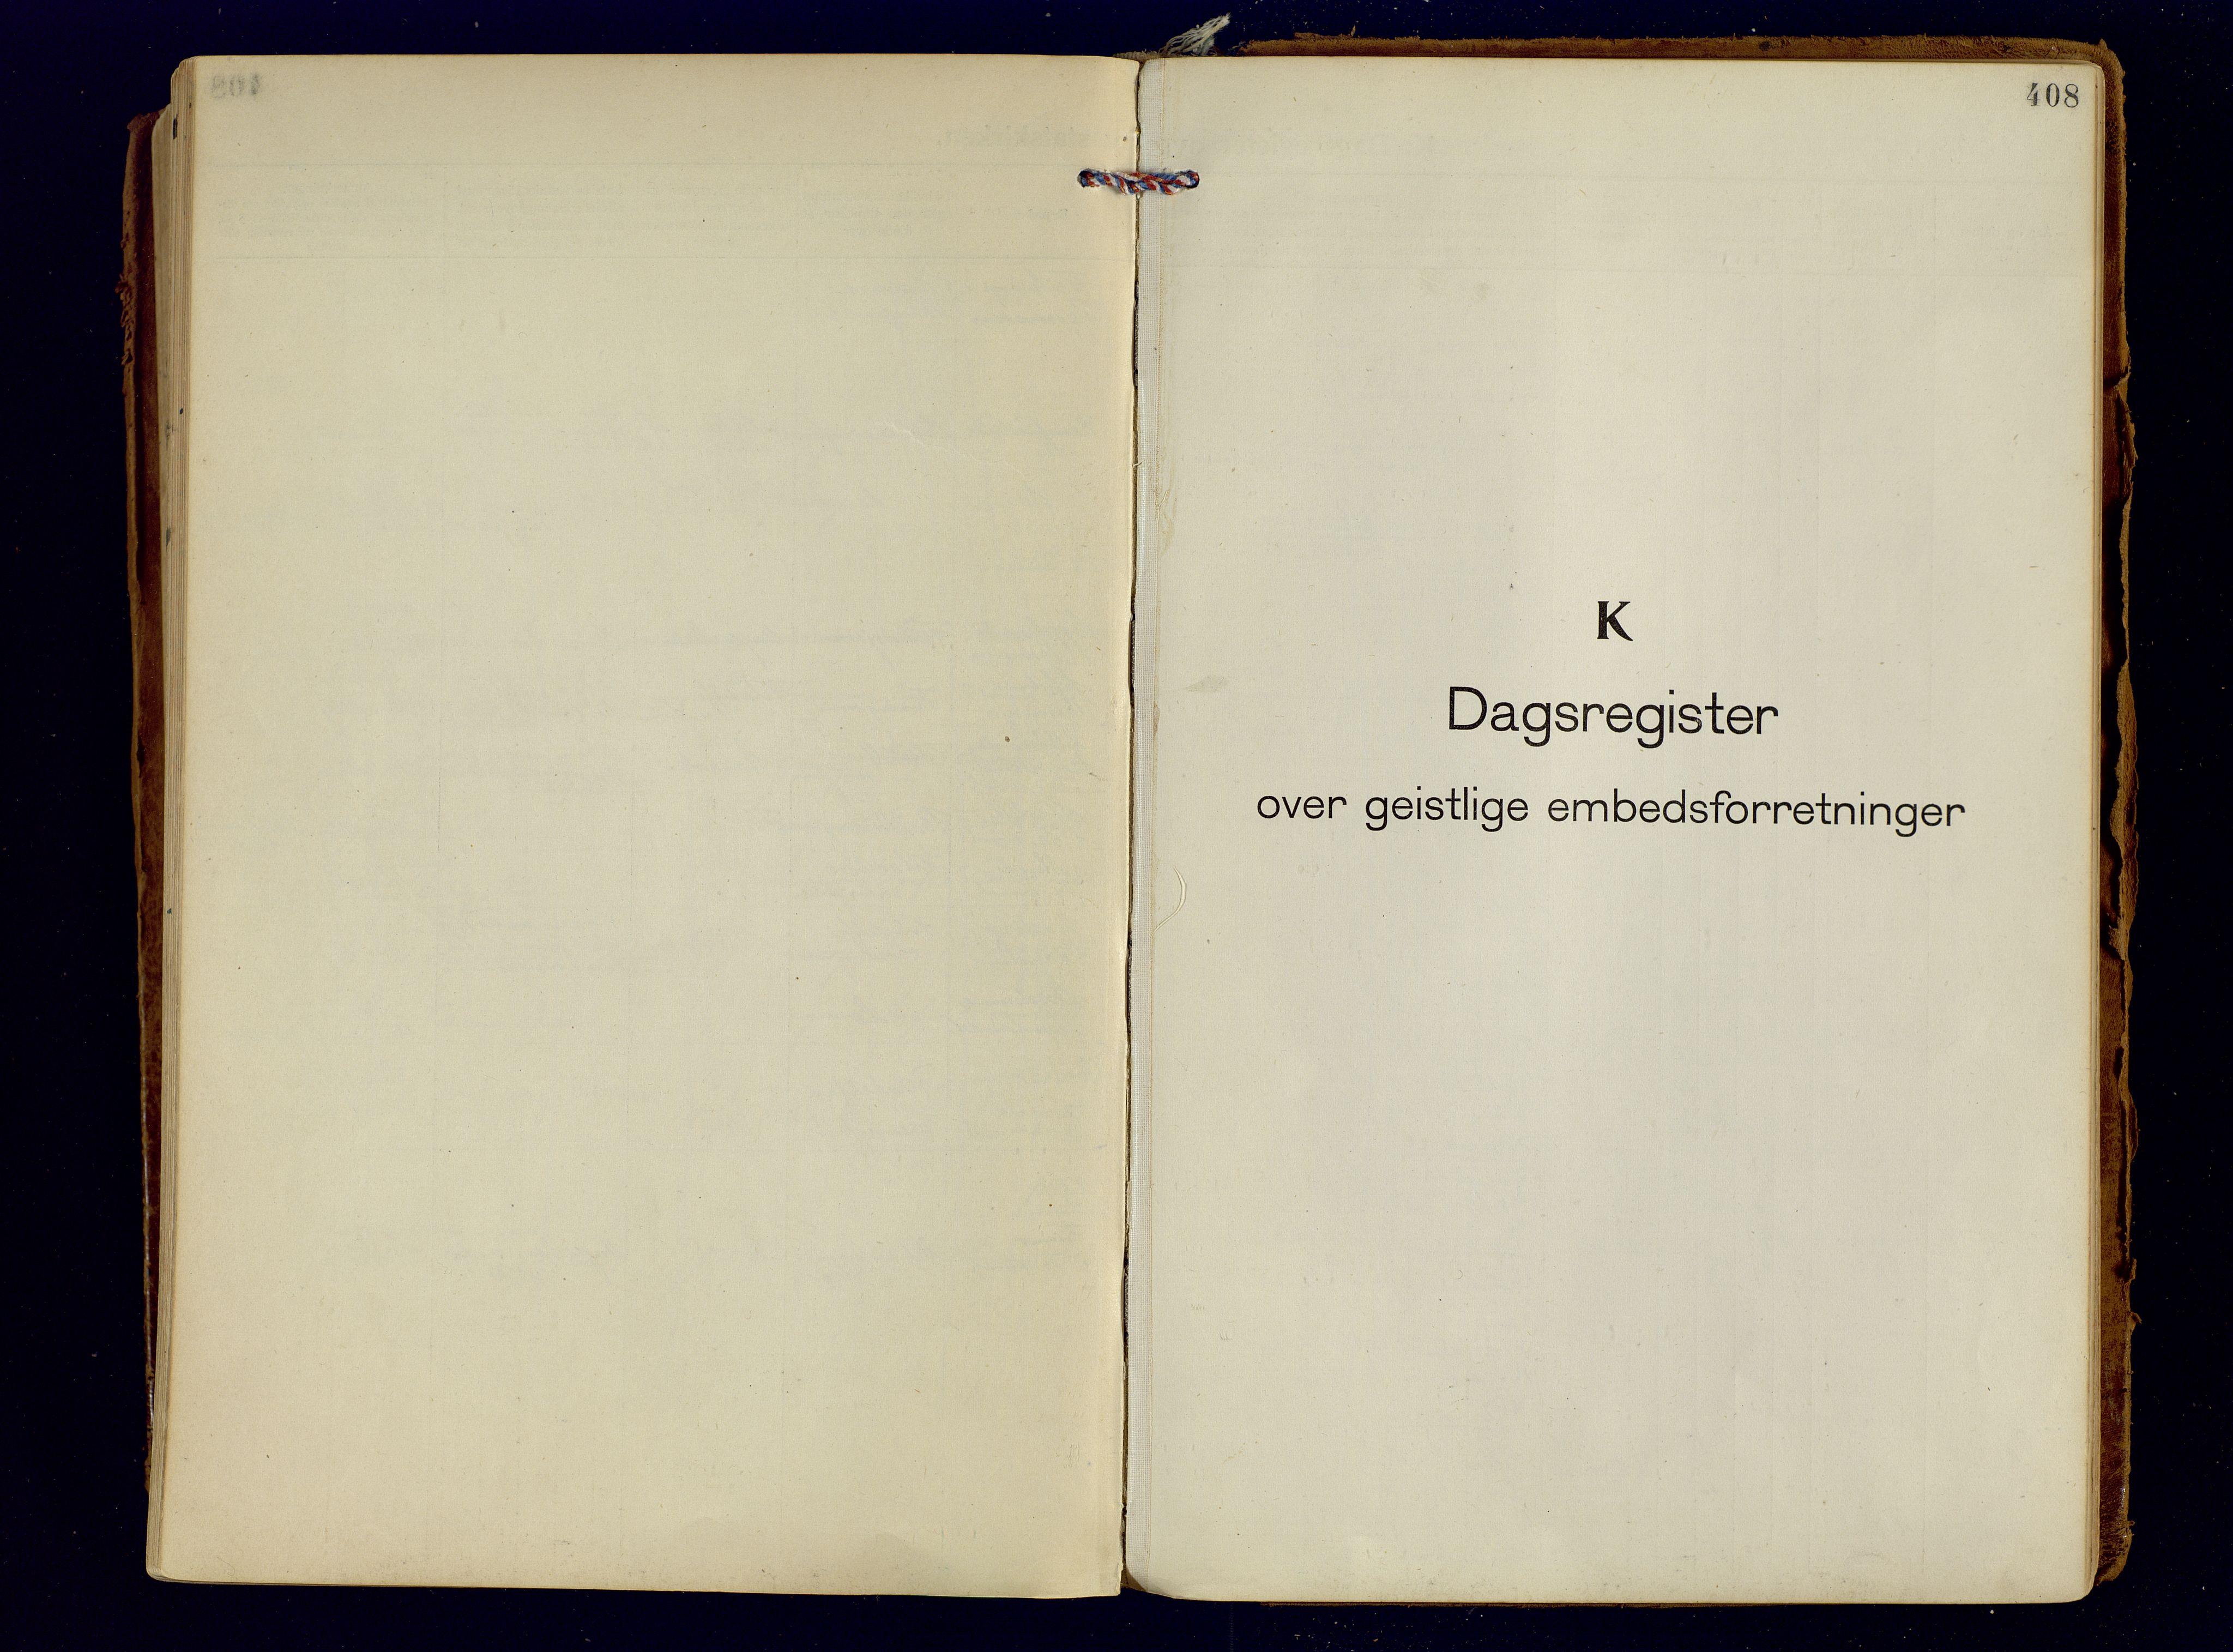 SATØ, Tromsøysund sokneprestkontor, G/Ga: Ministerialbok nr. 9, 1922-1934, s. 408